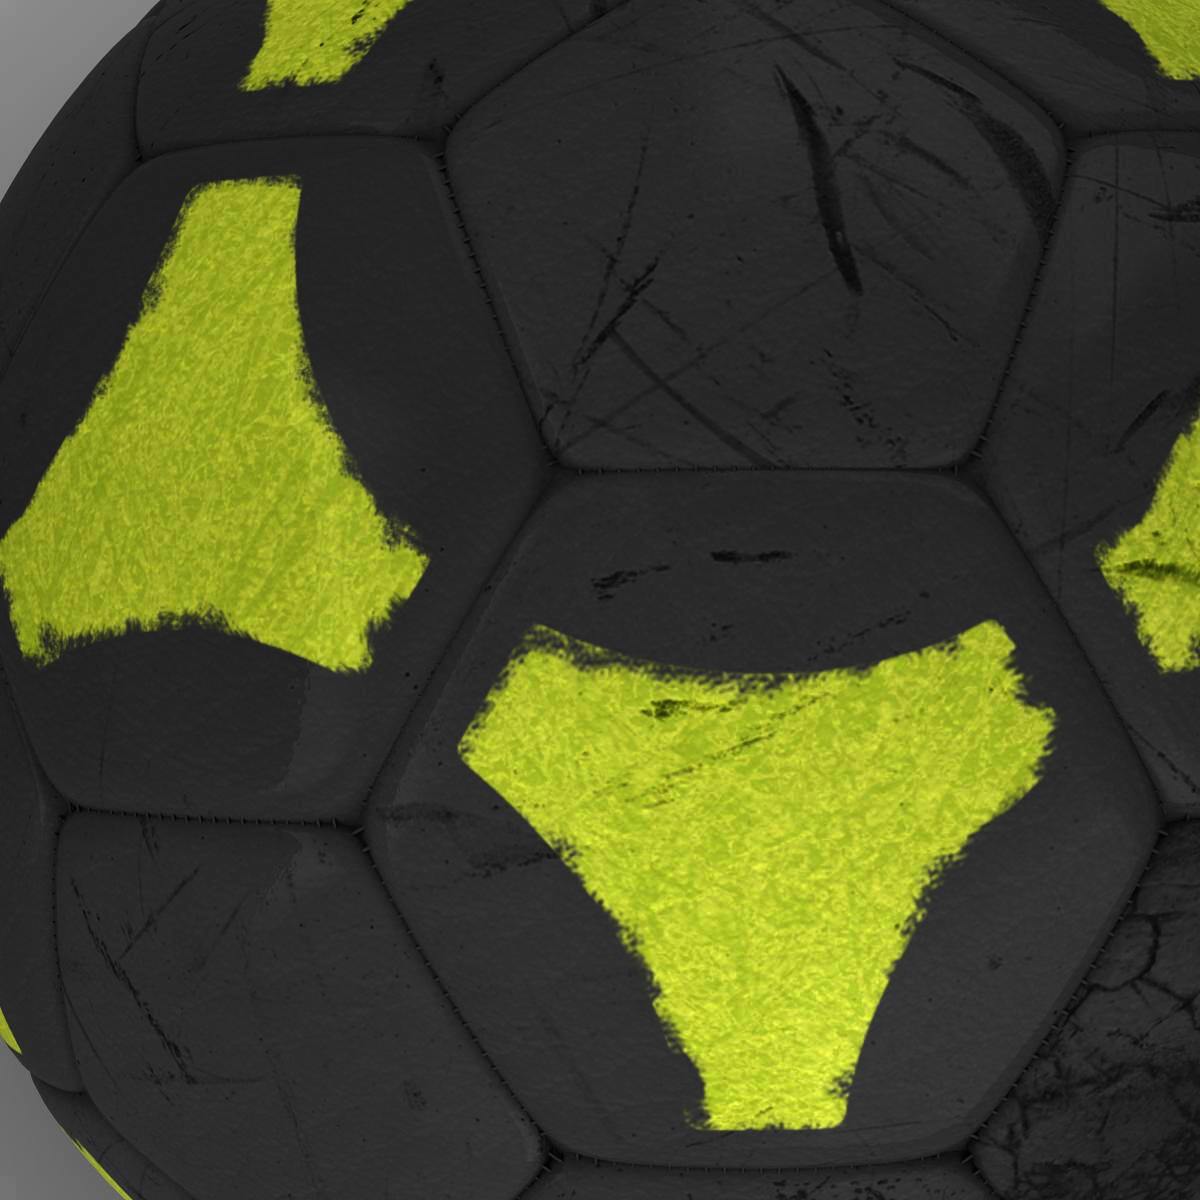 soccerball black yellow 3d model 3ds max fbx c4d ma mb obj 204208